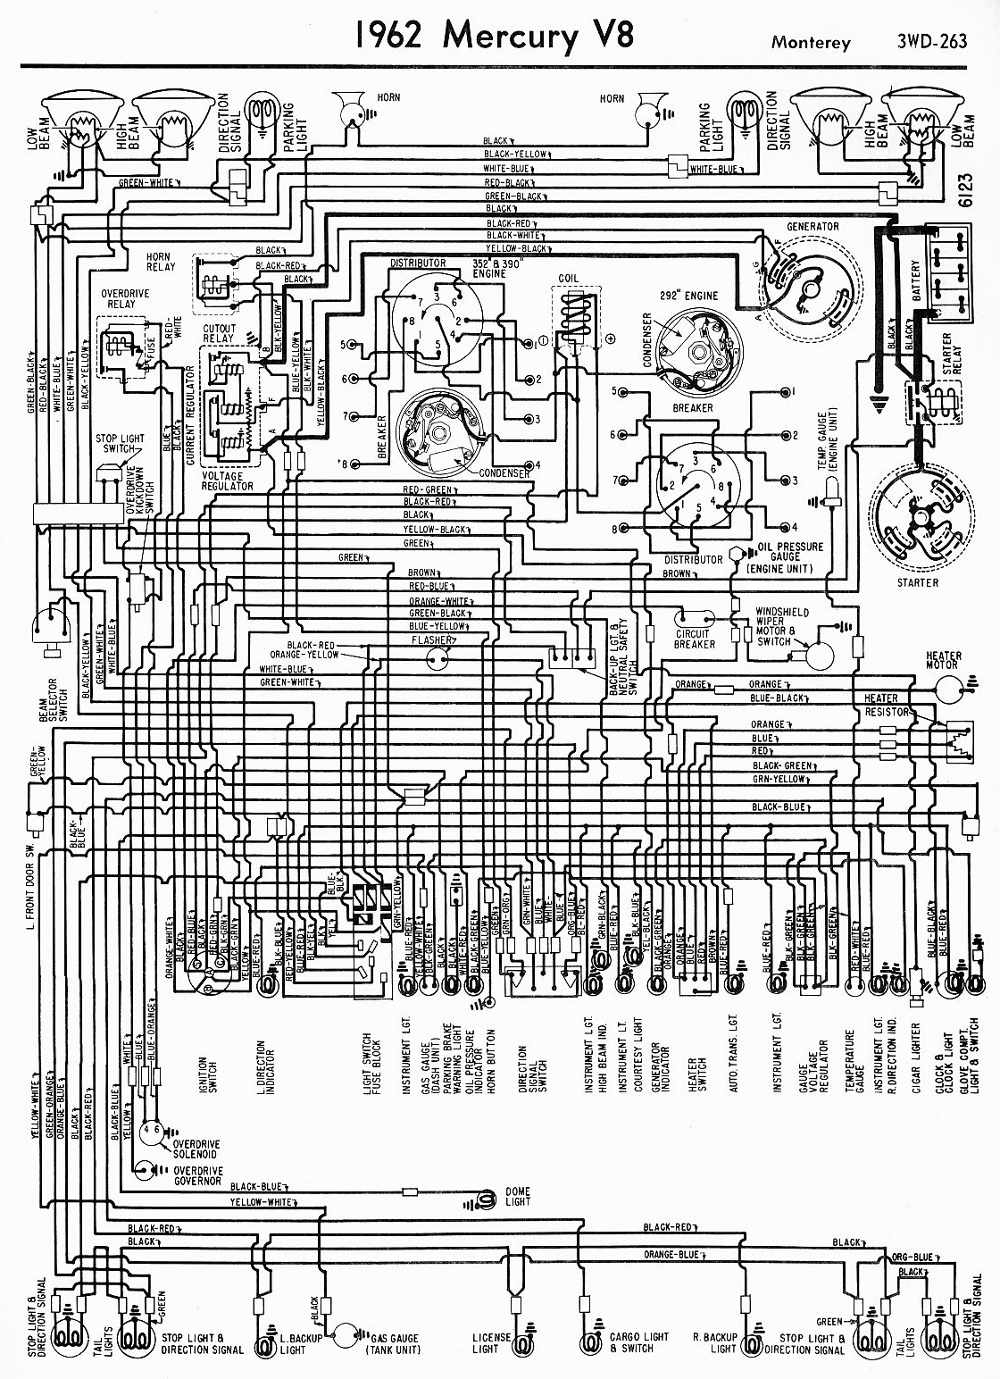 1962 Ford Galaxie Wiring Diagram Schematic Diagrams 1951 Color Mercury Zephyr 1965 Mustang 1950